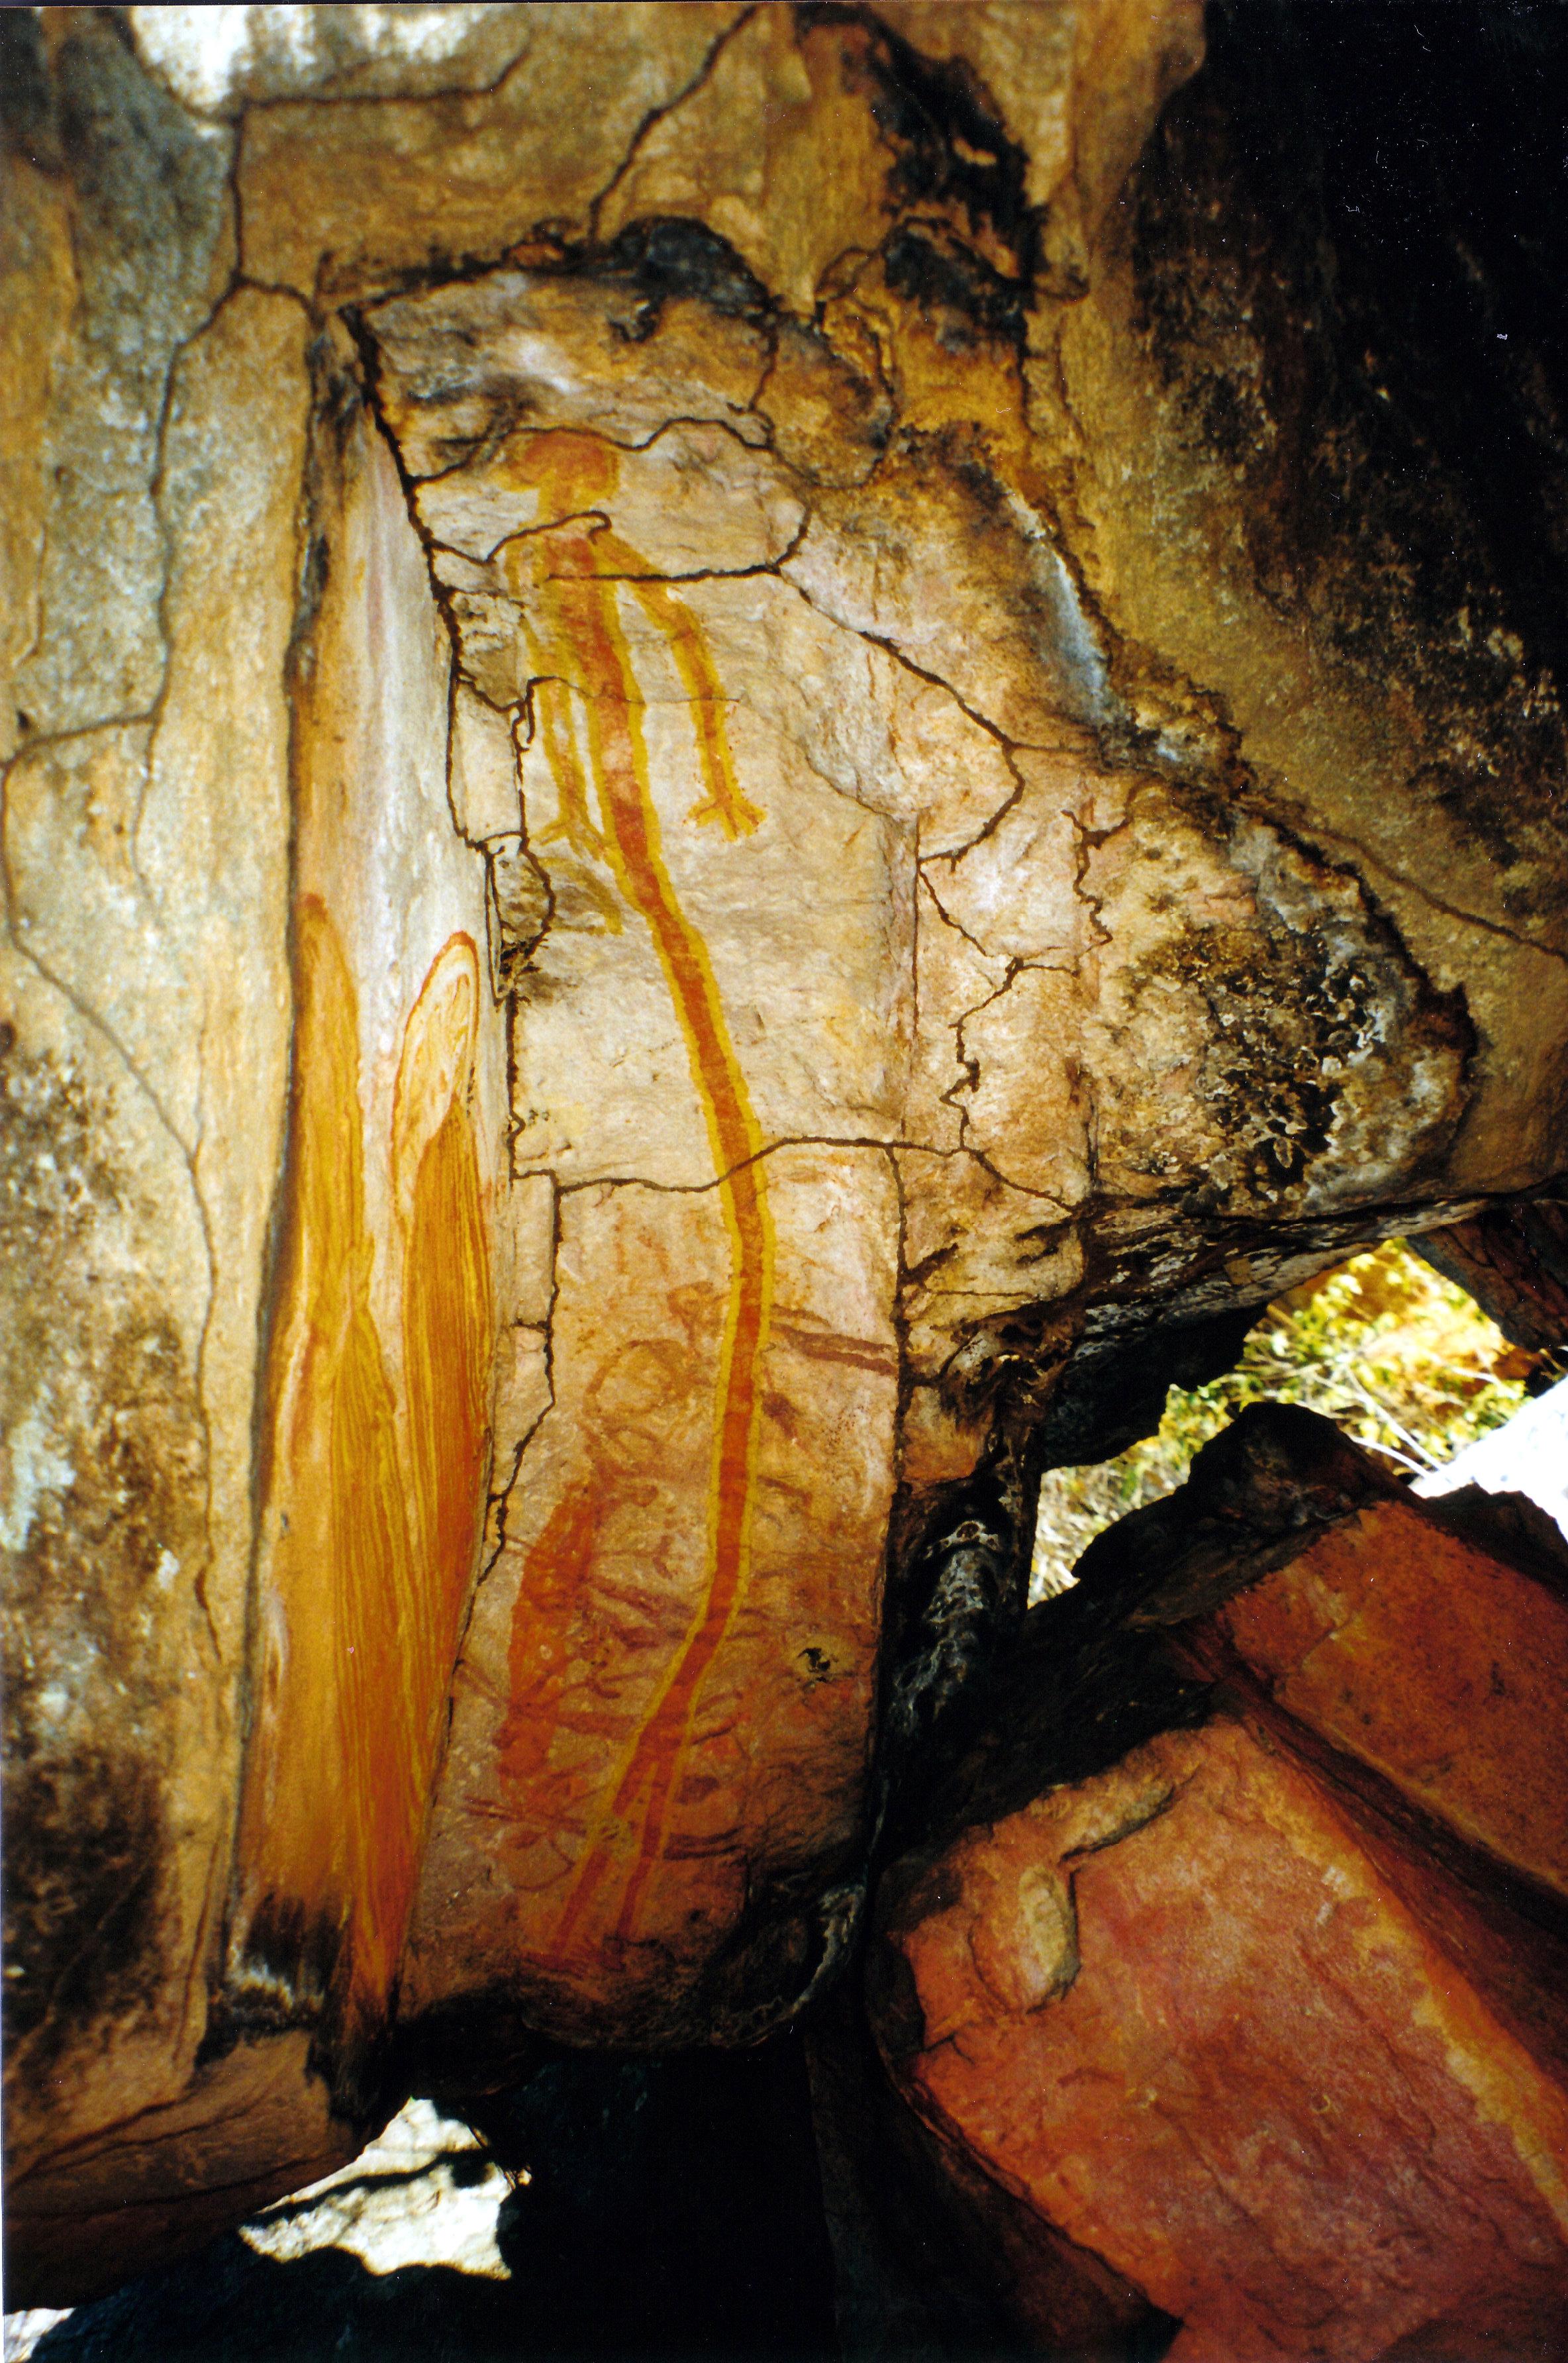 08-08-2000 10 skinny figure rock art King Edward River